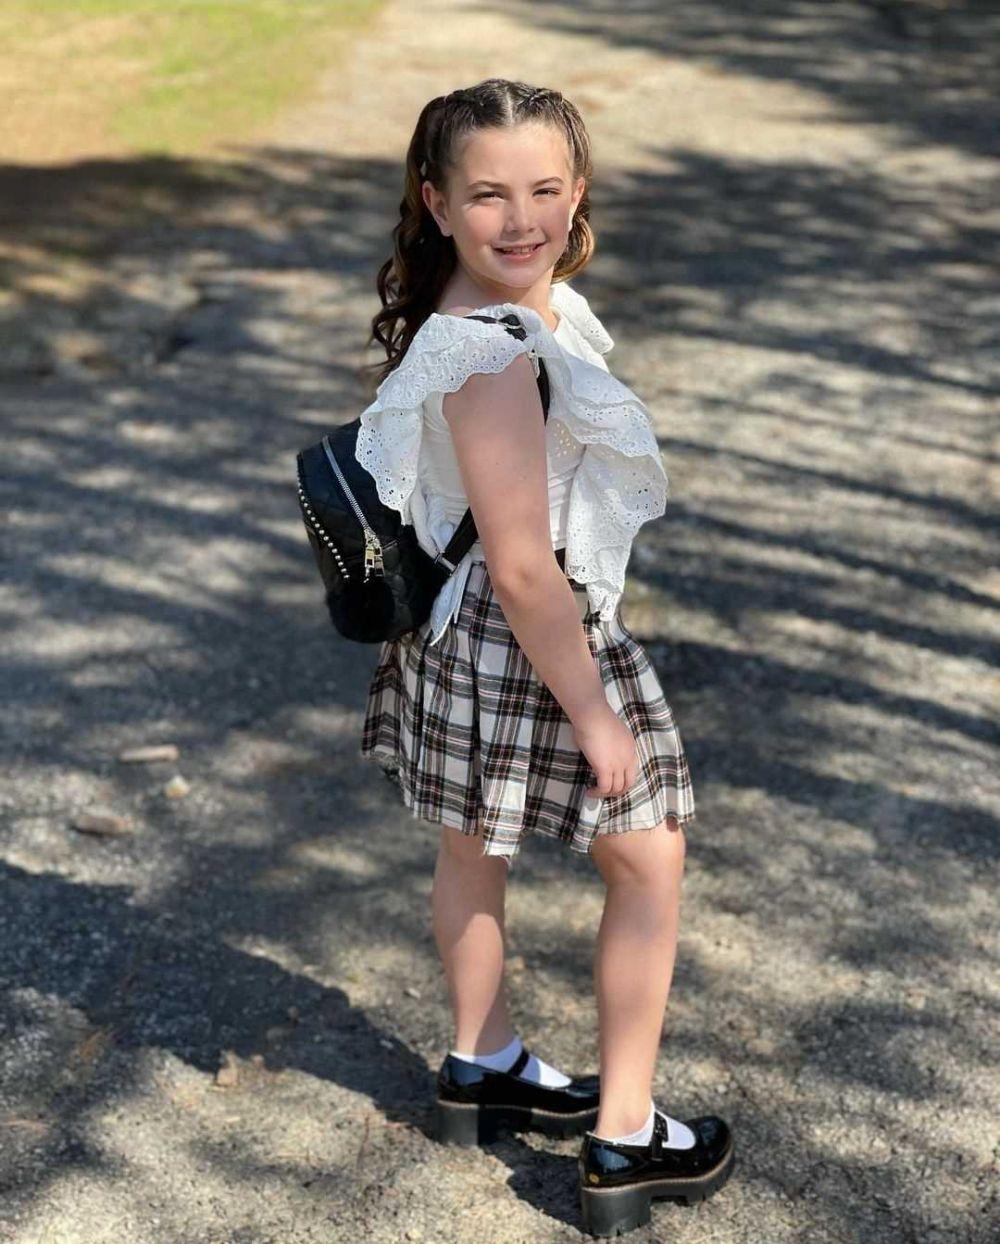 Bak Model, 9 Potret Lexi Rabe, Anak Tony Stark di Avengers: Endgame